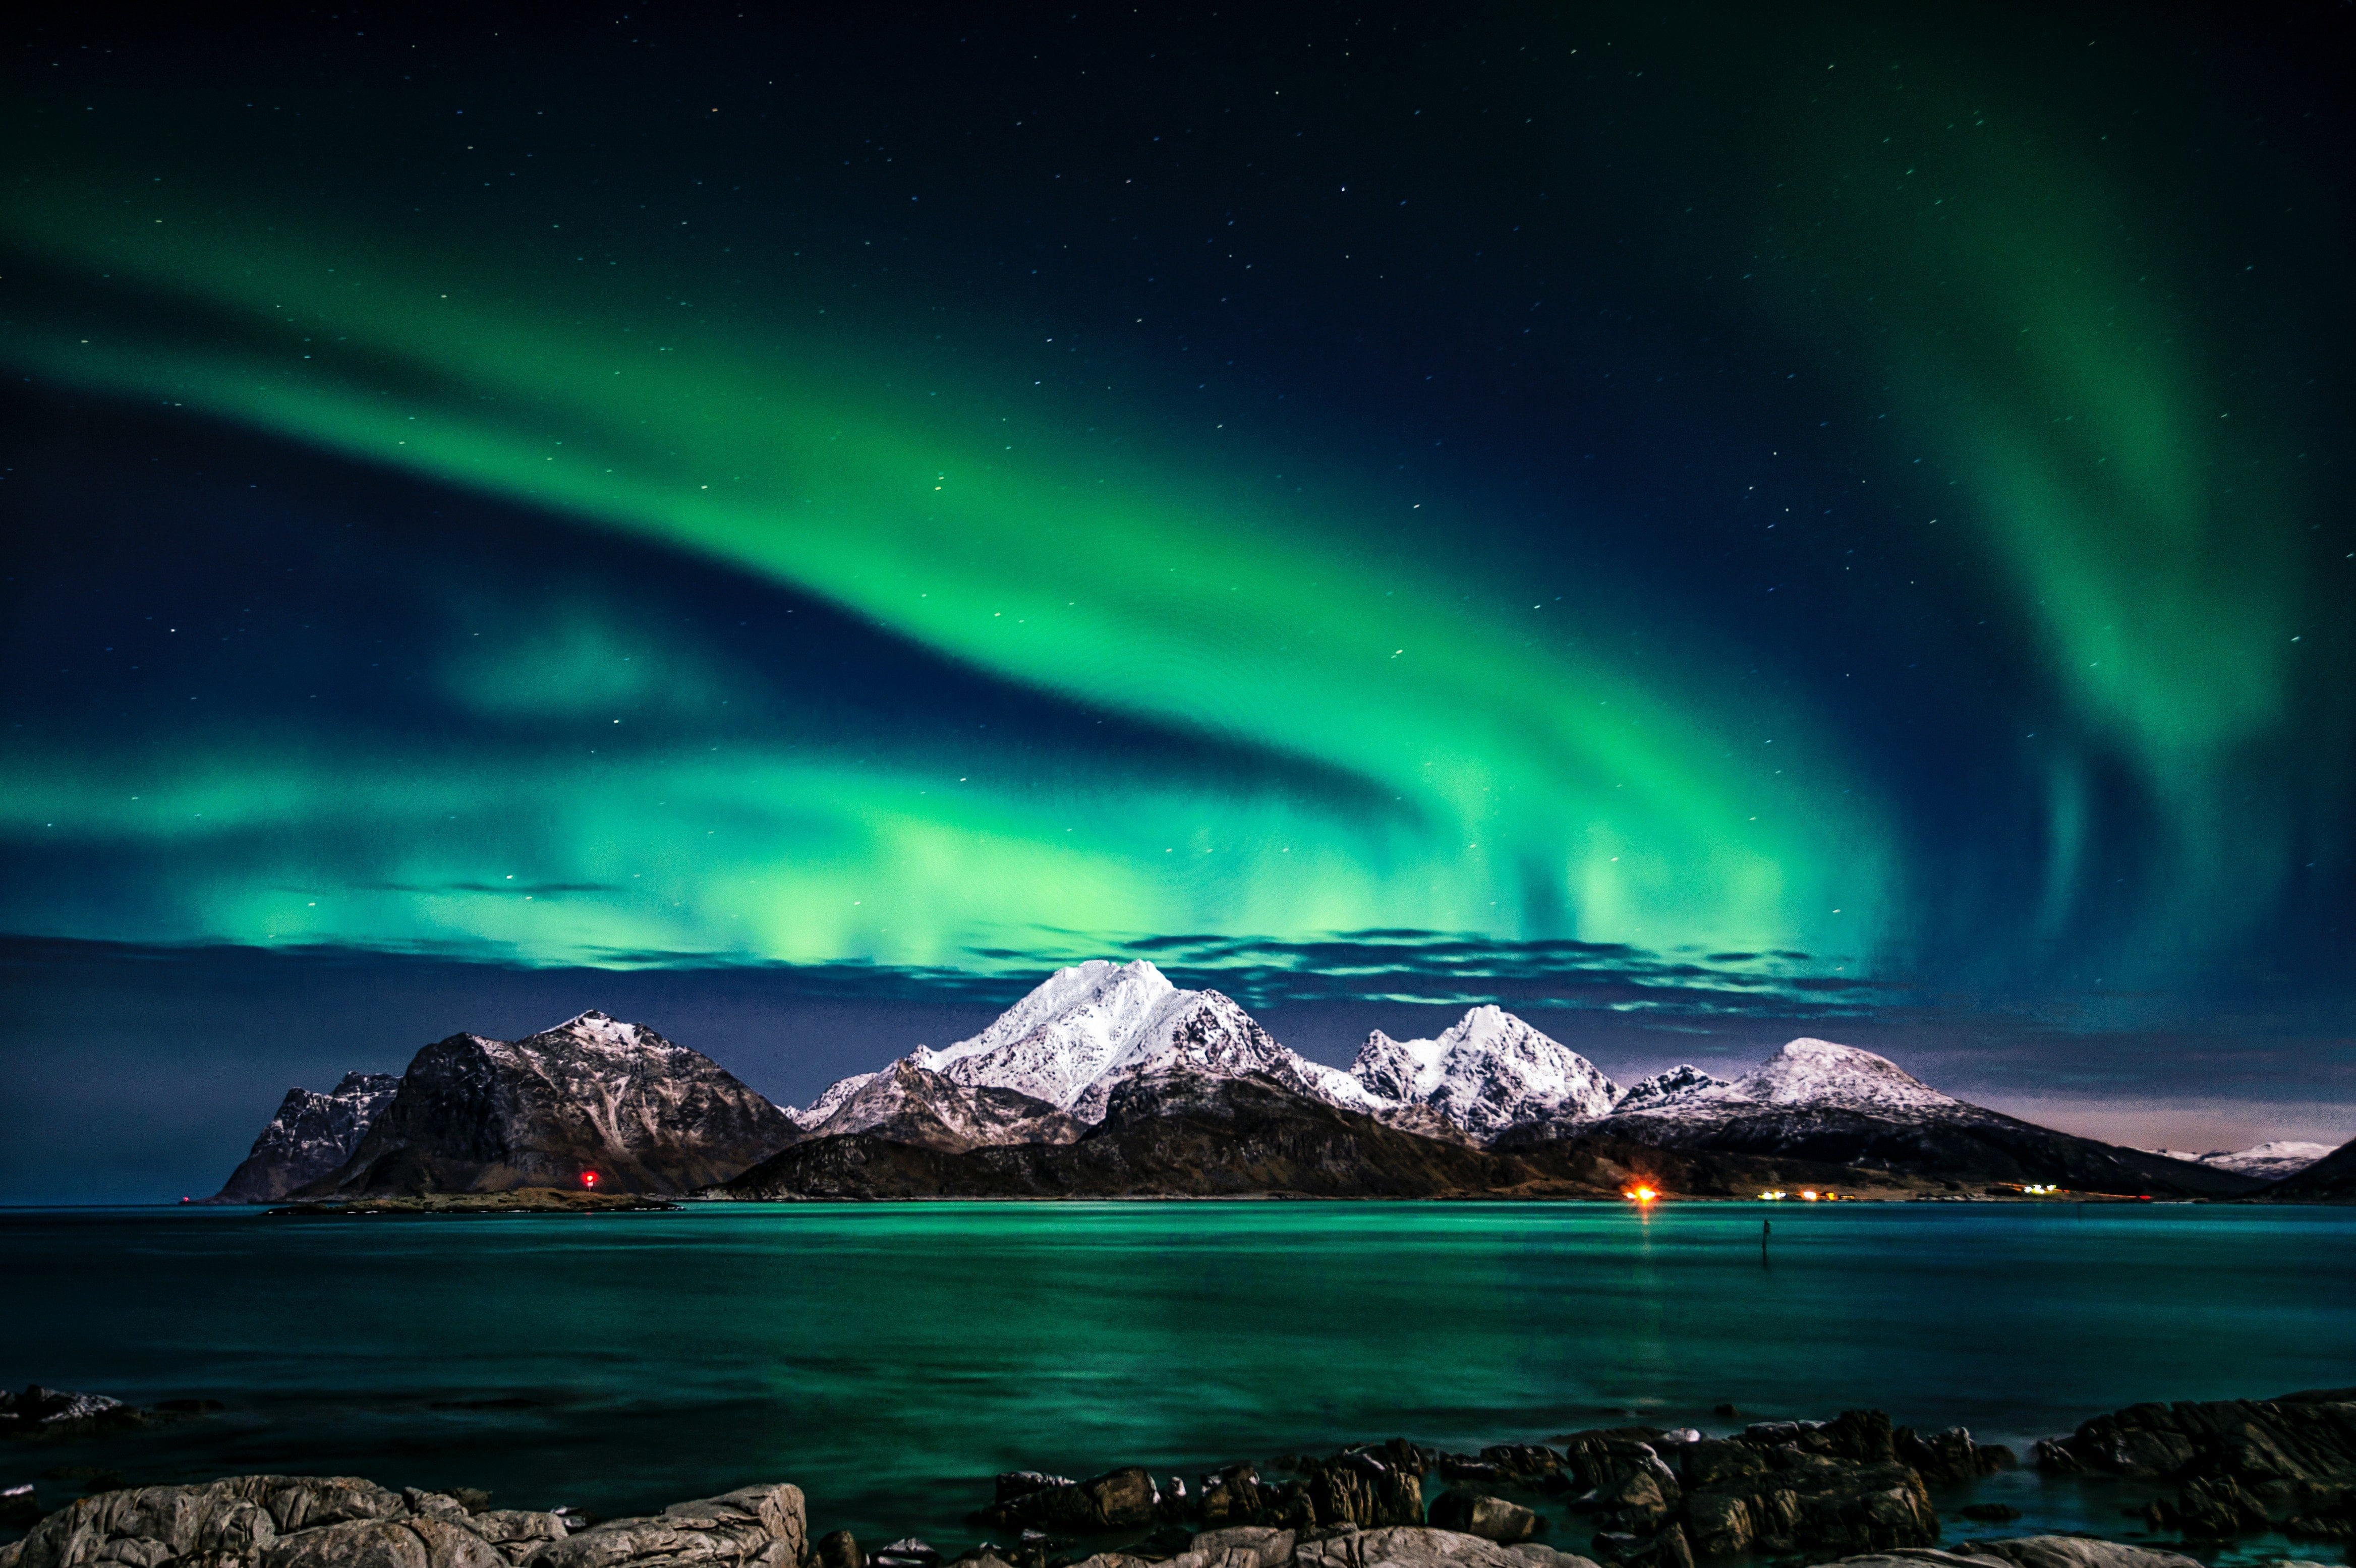 Et paradigmeskifte for norsk sokkel